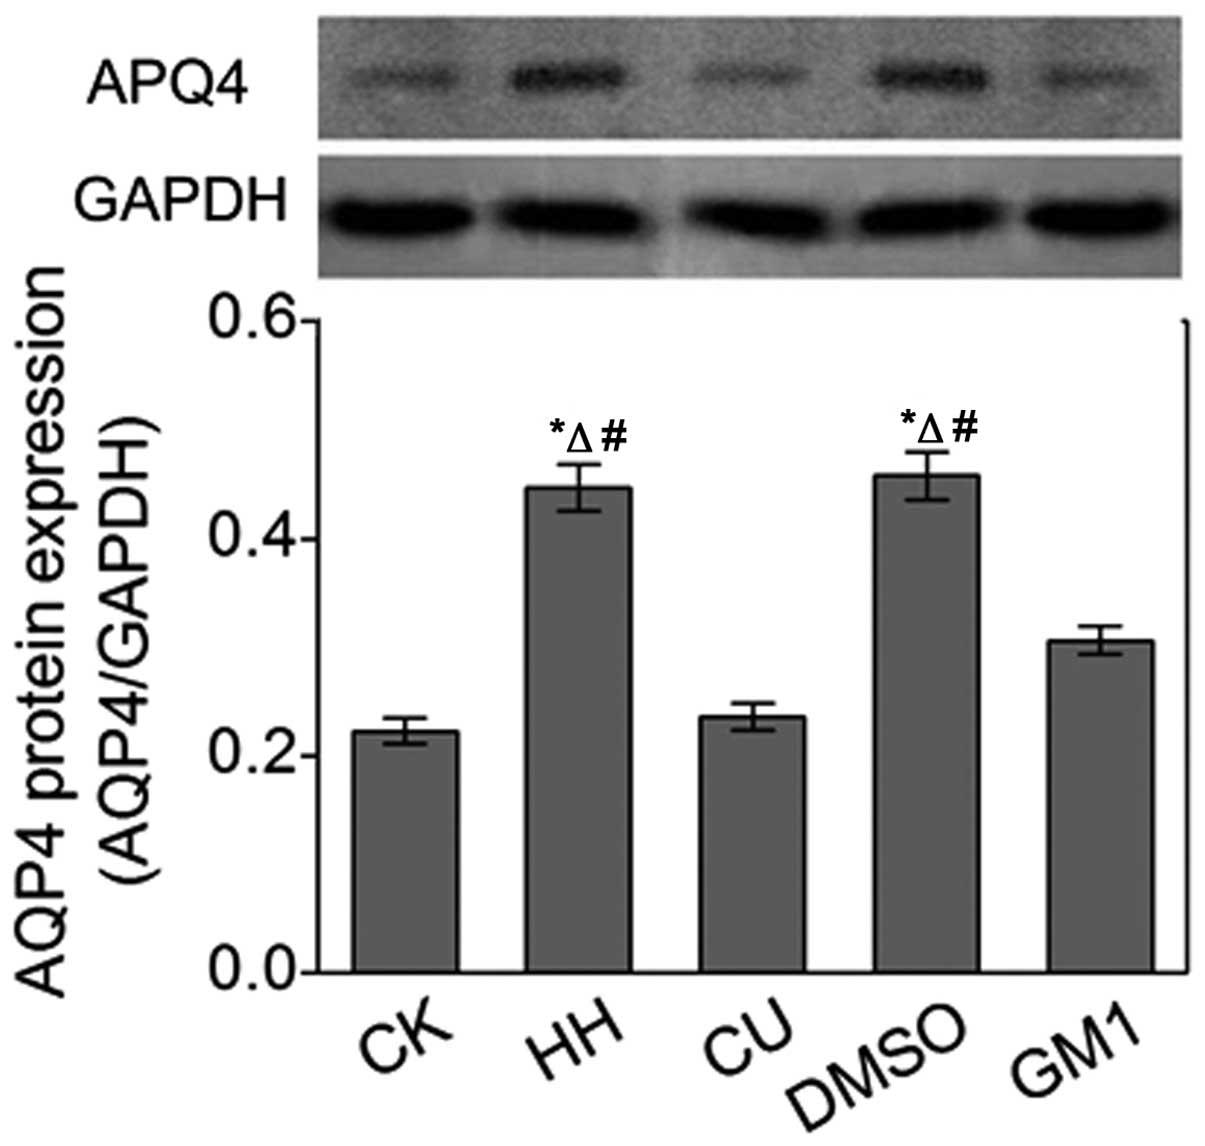 Curcumin alleviates brain edema by lowering AQP4 expression levels